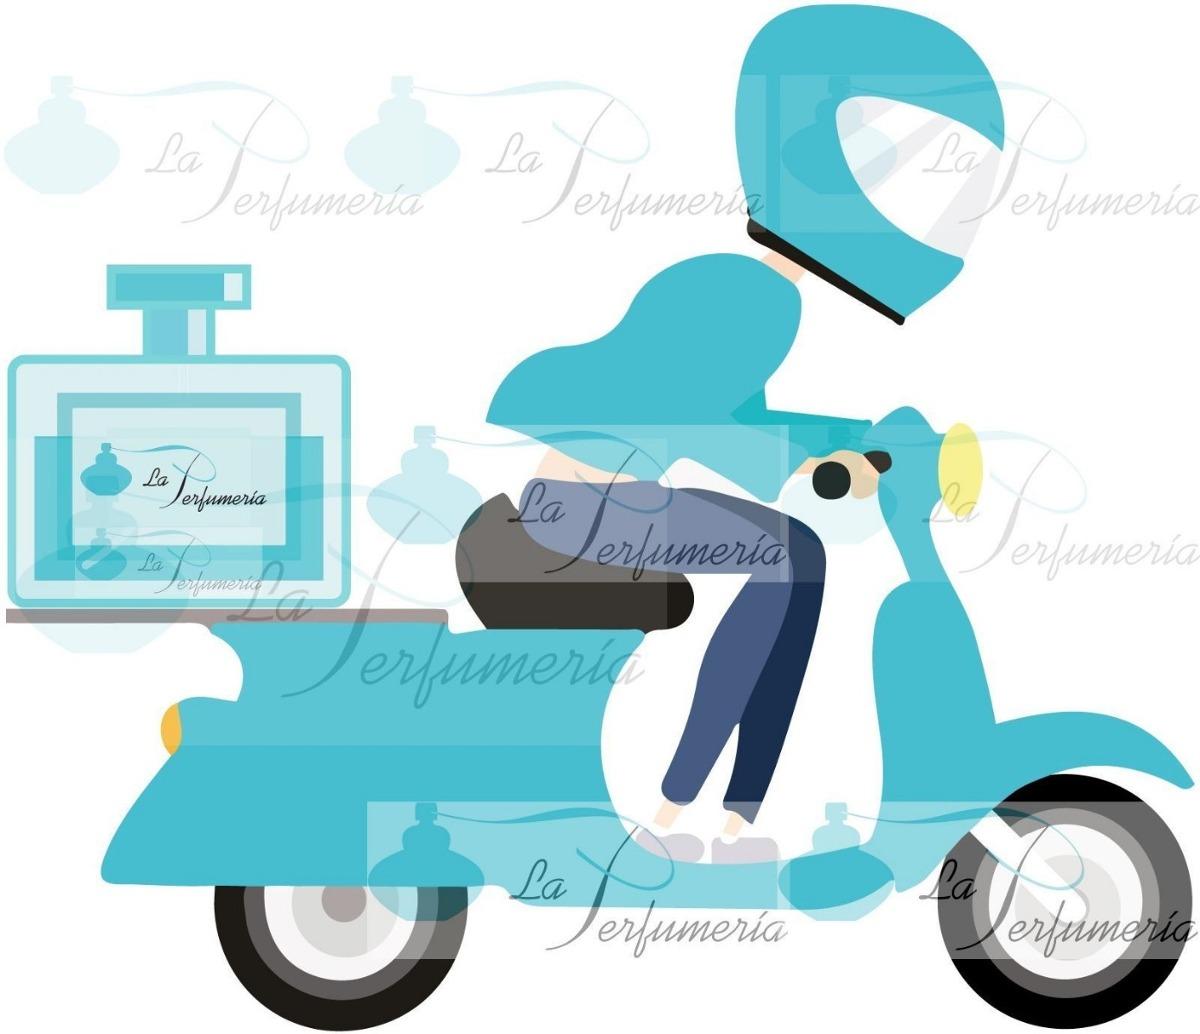 c5b82720f Perfume Original Light Blue Hombre 125ml Edt Dolce & Gabbana - ¢ 29,500.00  en Mercado Libre COMPRAR PERFUMES en COSTA RICA ...